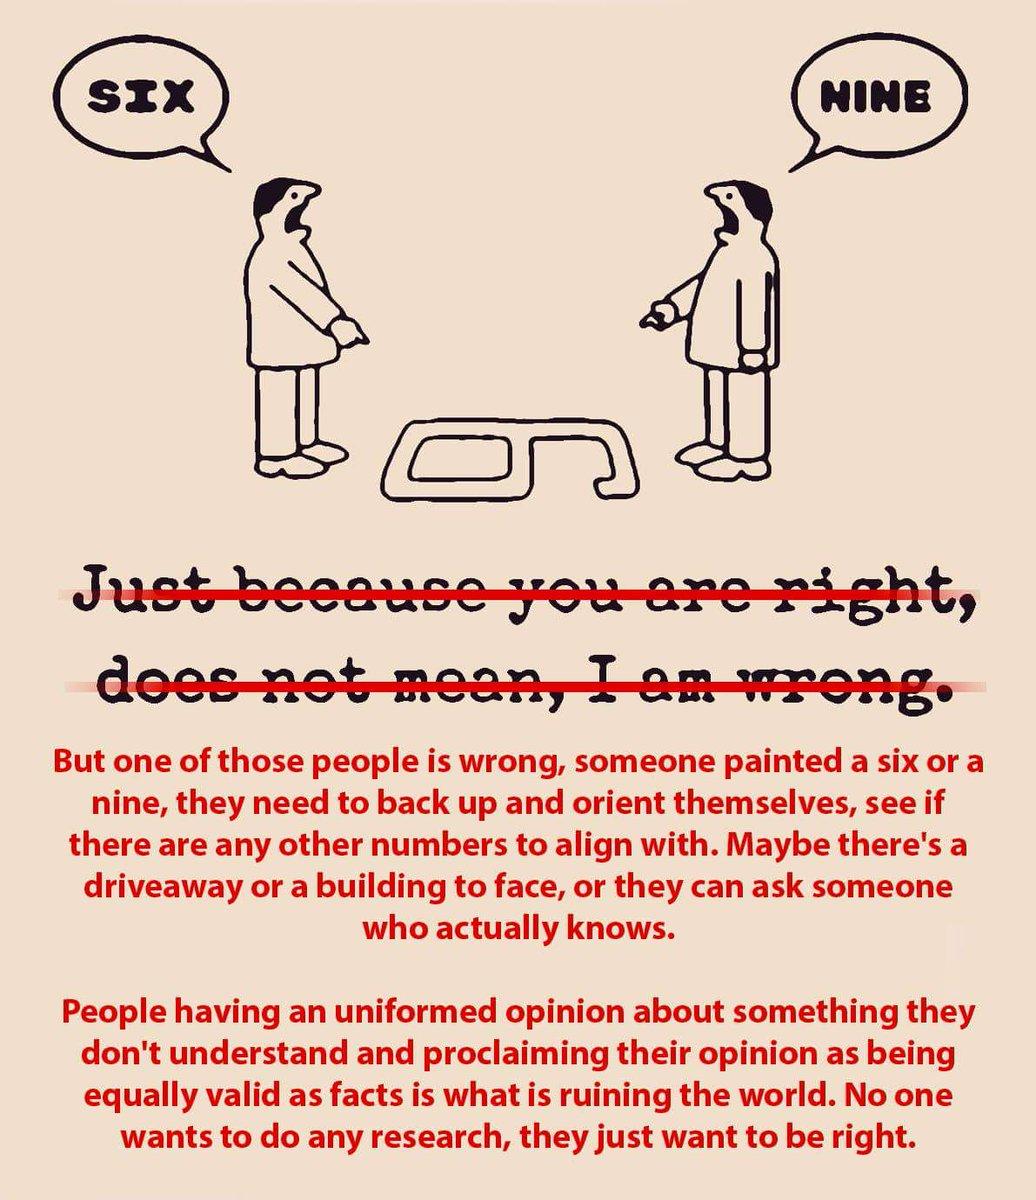 Setuju. Perspective mah urusan lo. Tapi Pasti ada yg salah. https://t.co/98JIDQHAwO